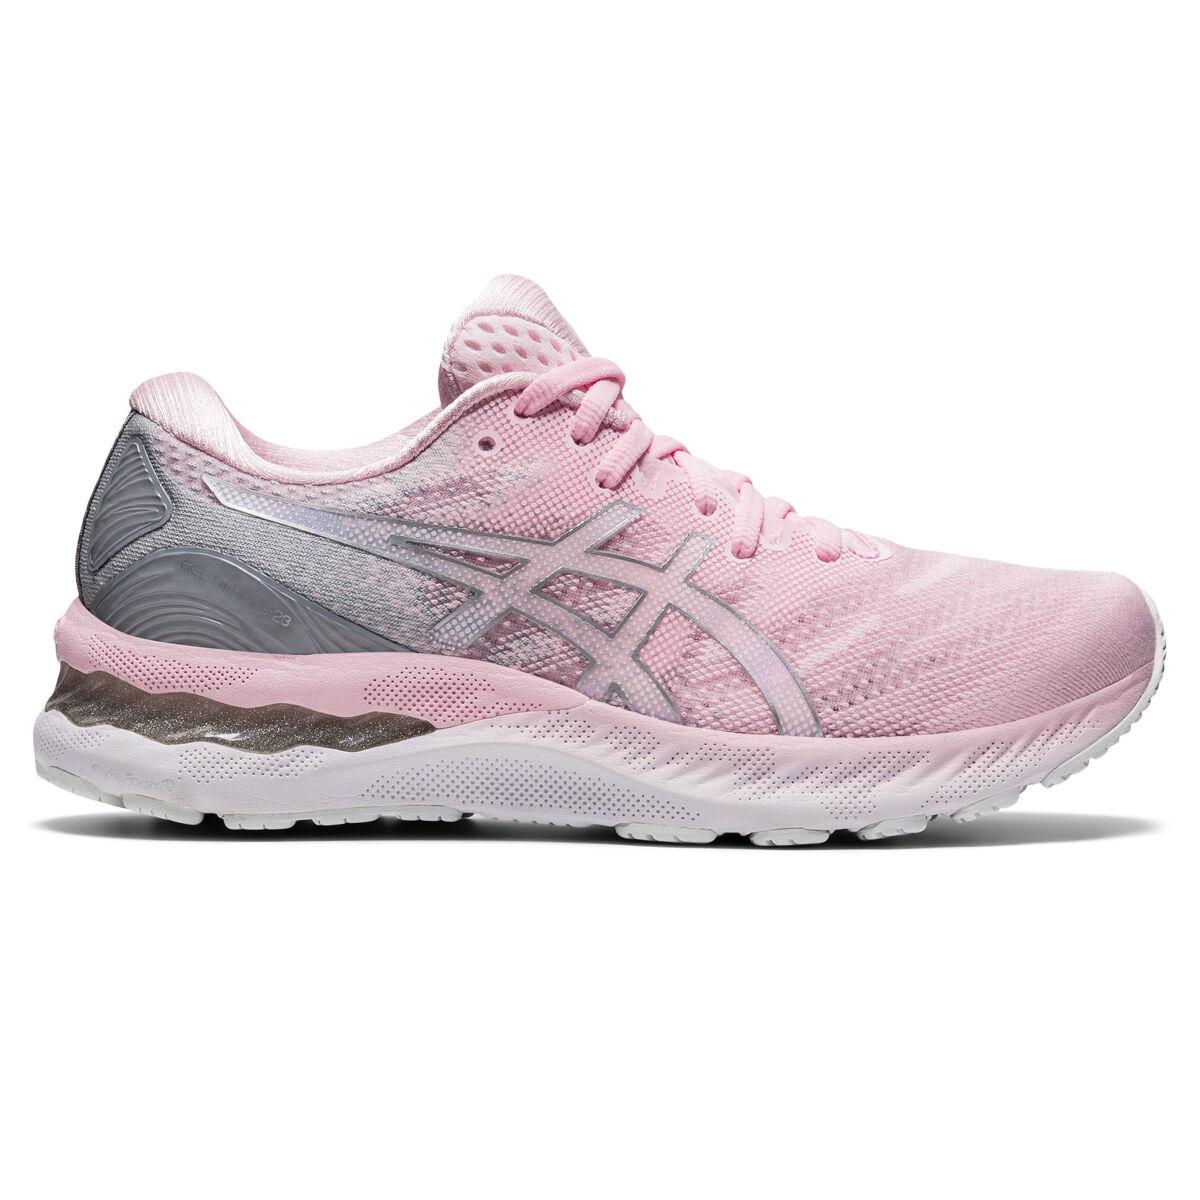 Asics GEL Nimbus 23 Womens Running Shoes